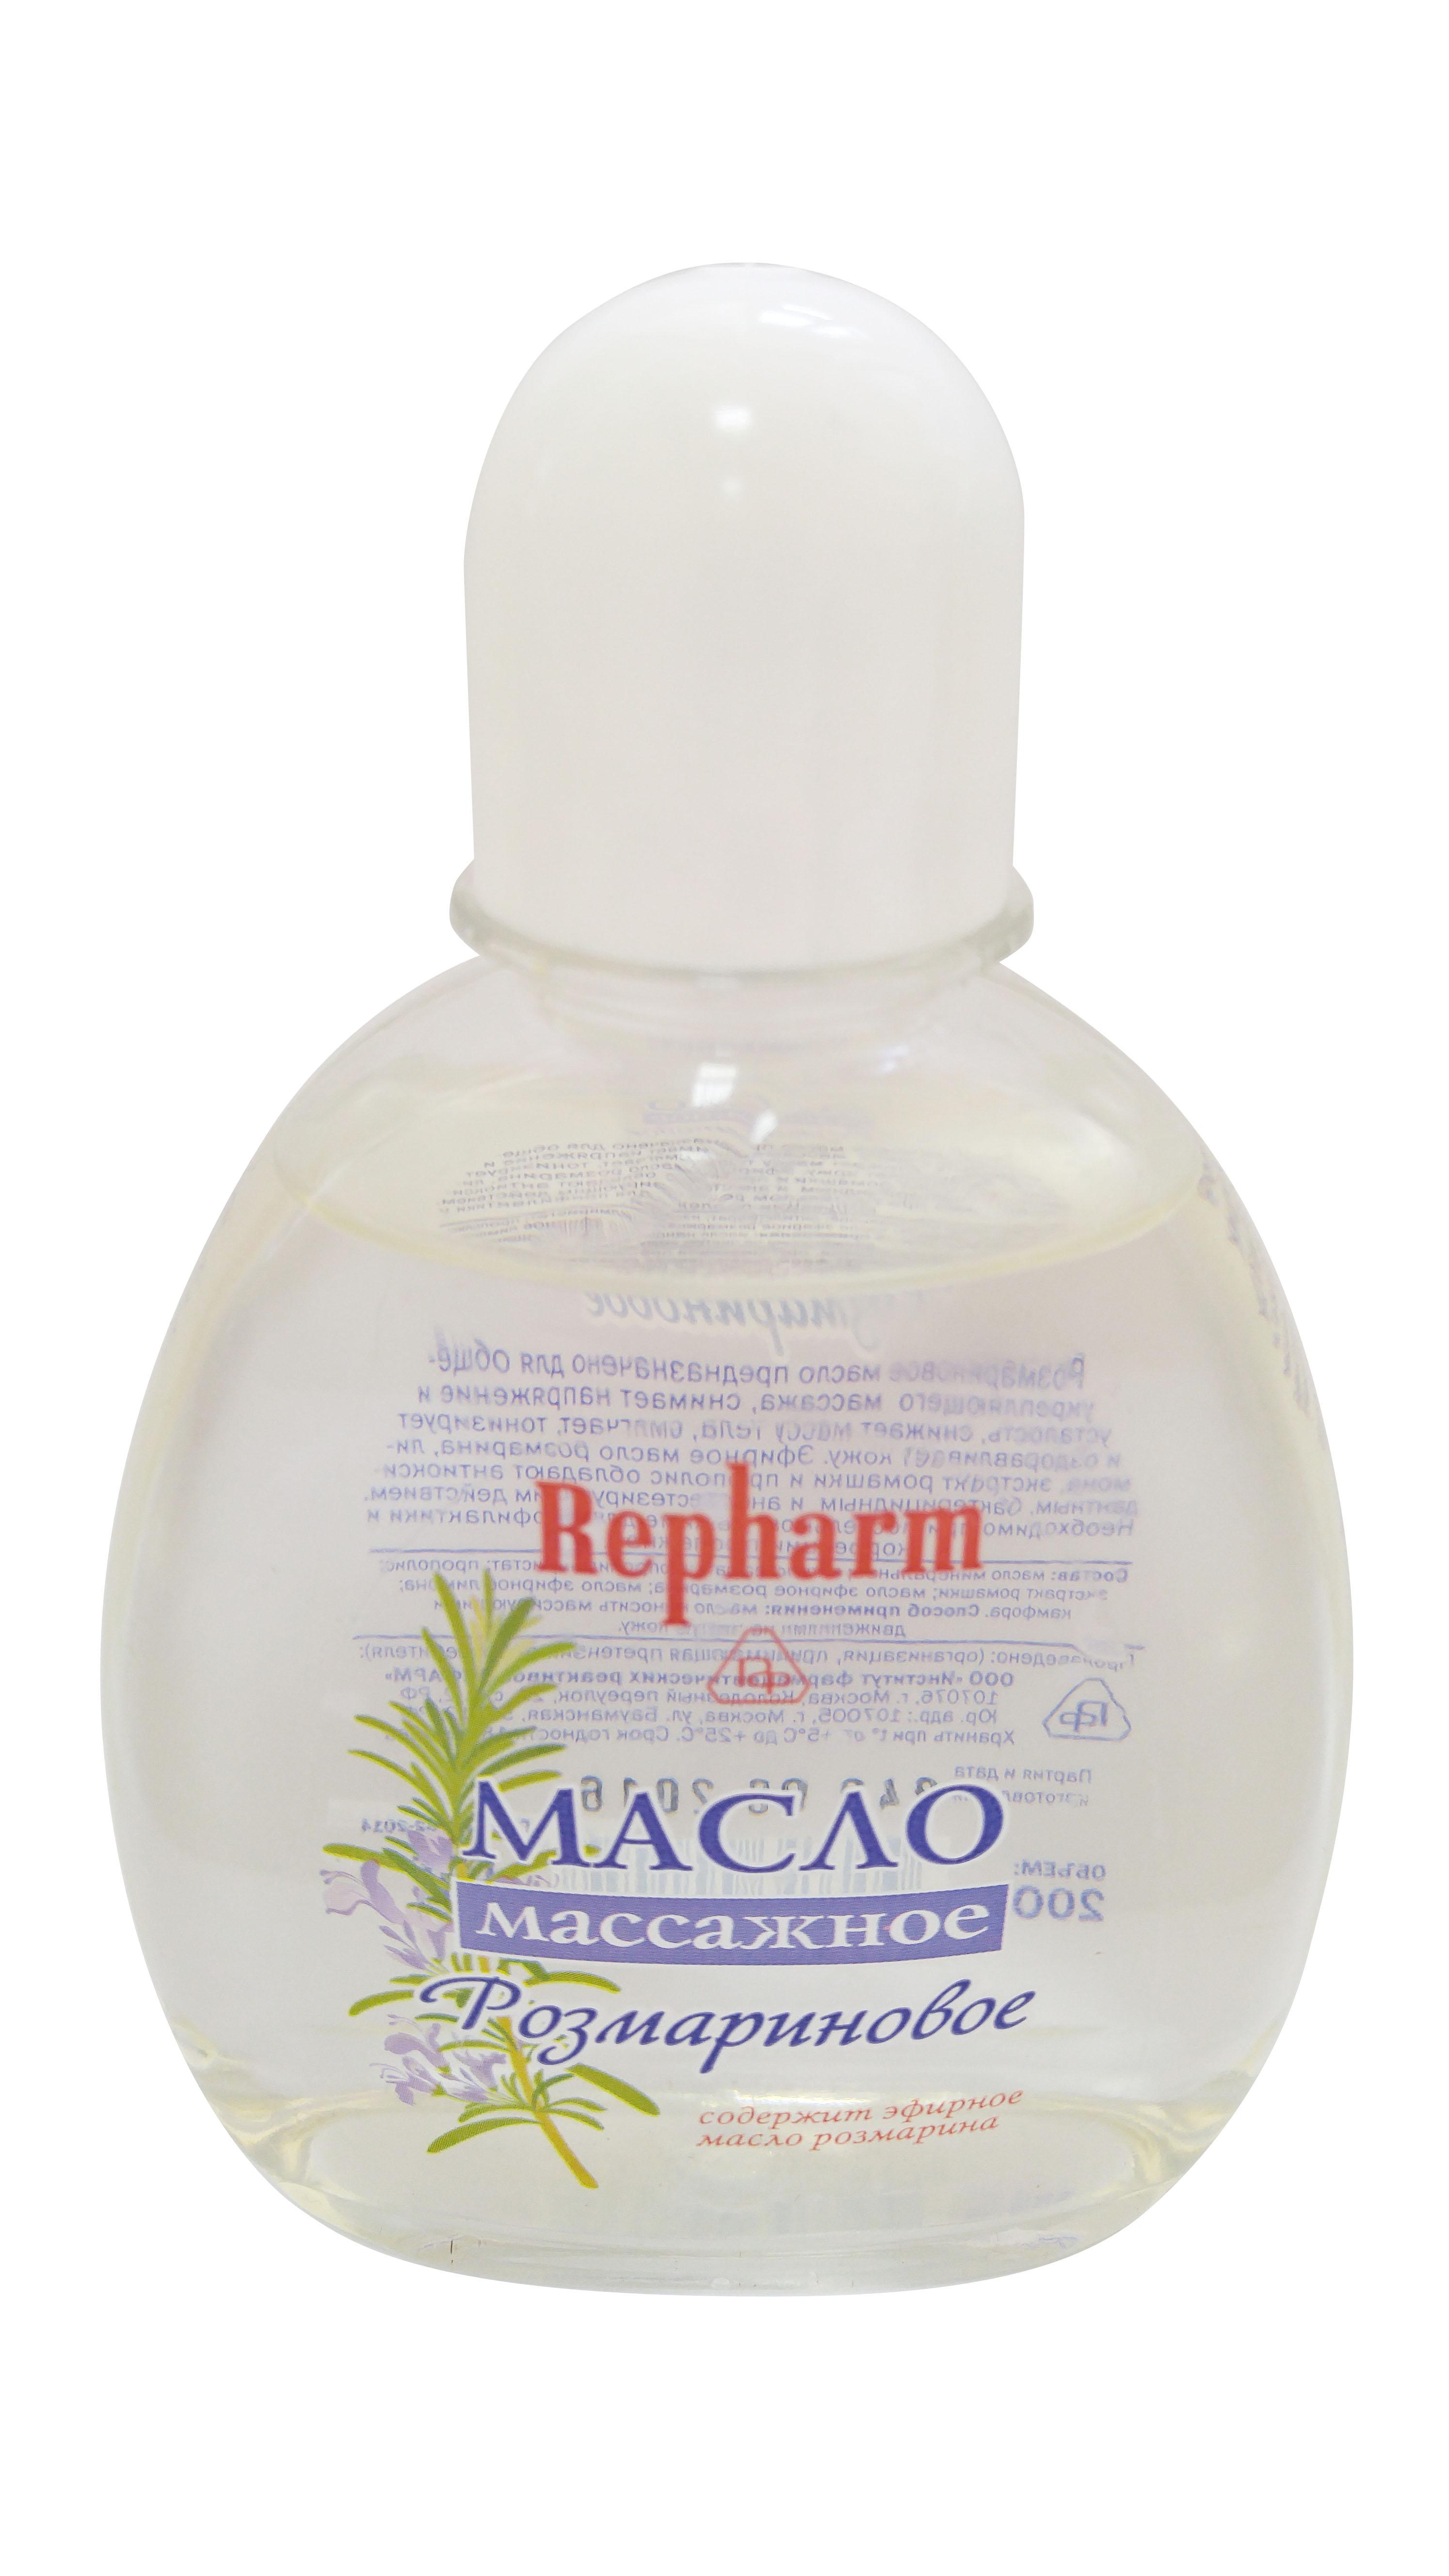 ������ ����� ��������� ������������Ż / Repharm 200��